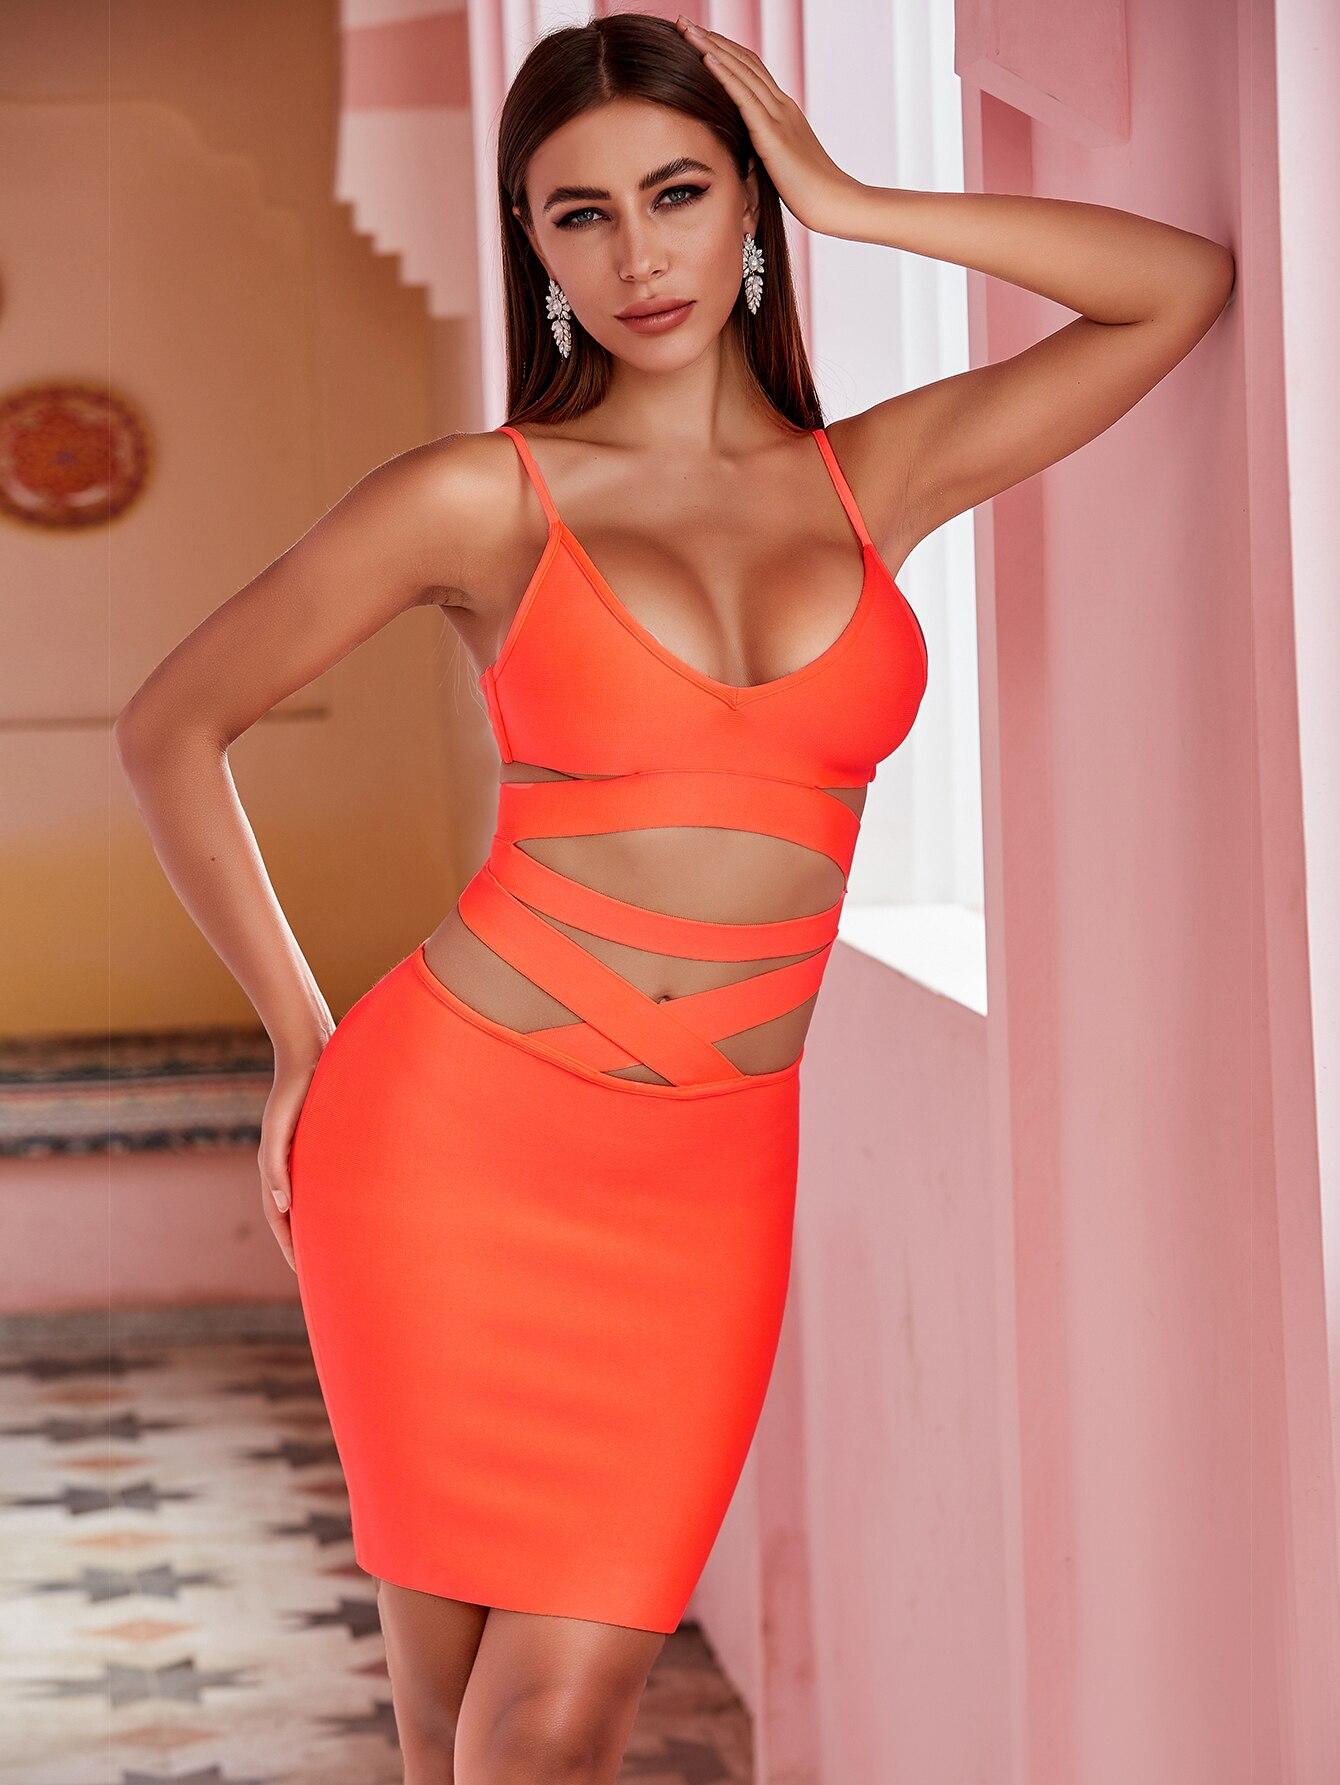 Newest Summer Fashion Sexy V Neck Cut Out Hollow Out Orange Bodycon Women Bandage Dress 2020 Elegant Evening Party Dress Vestido